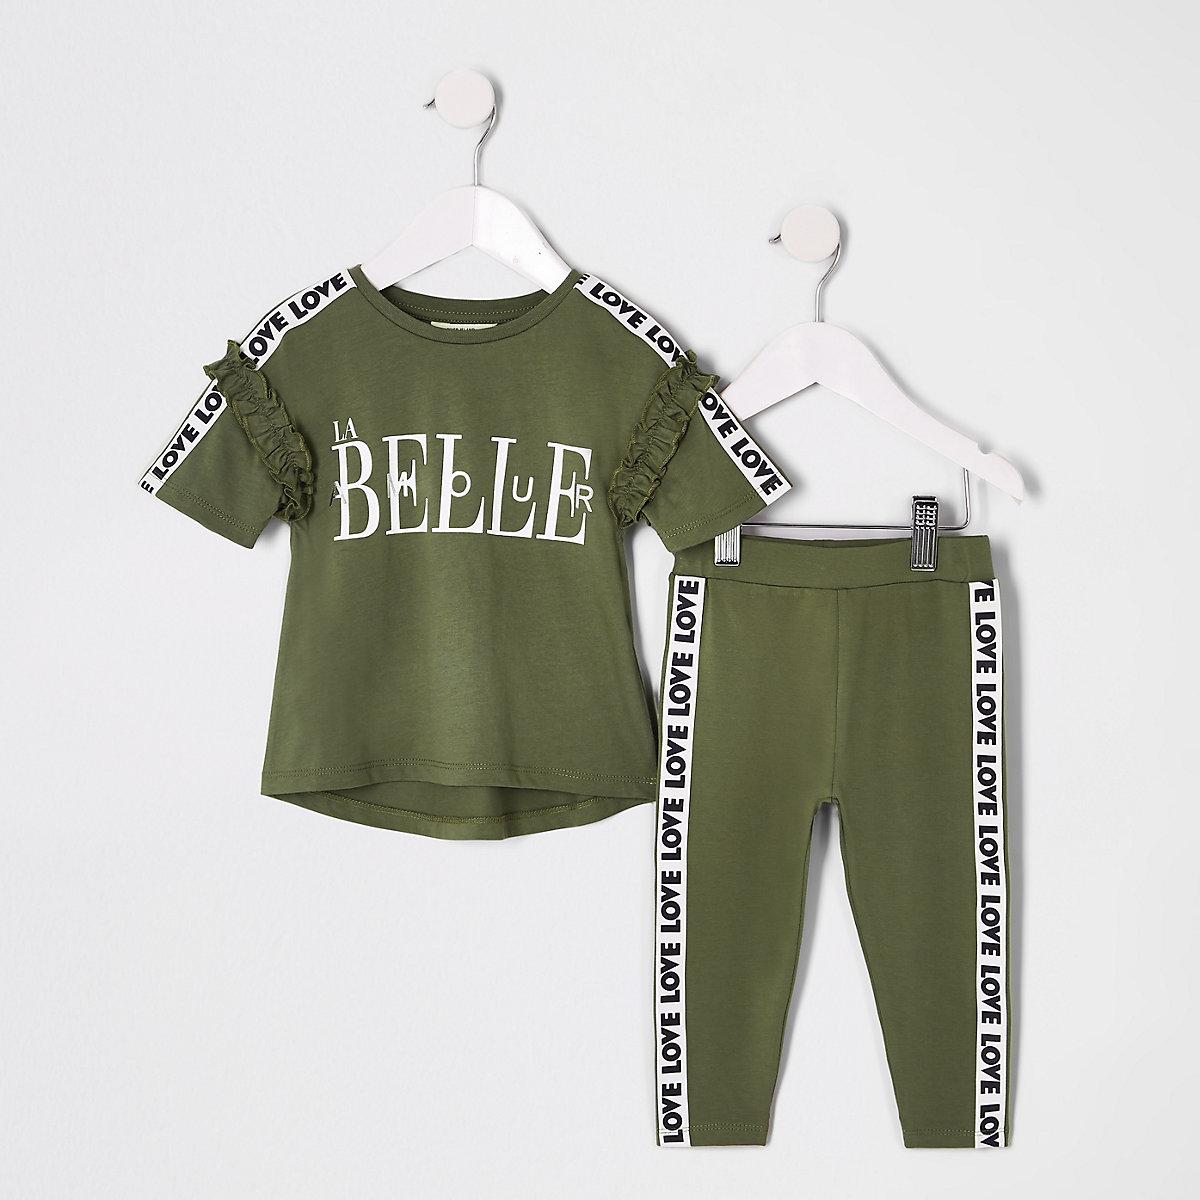 Mini girls khaki 'La belle' T-shirt outfit